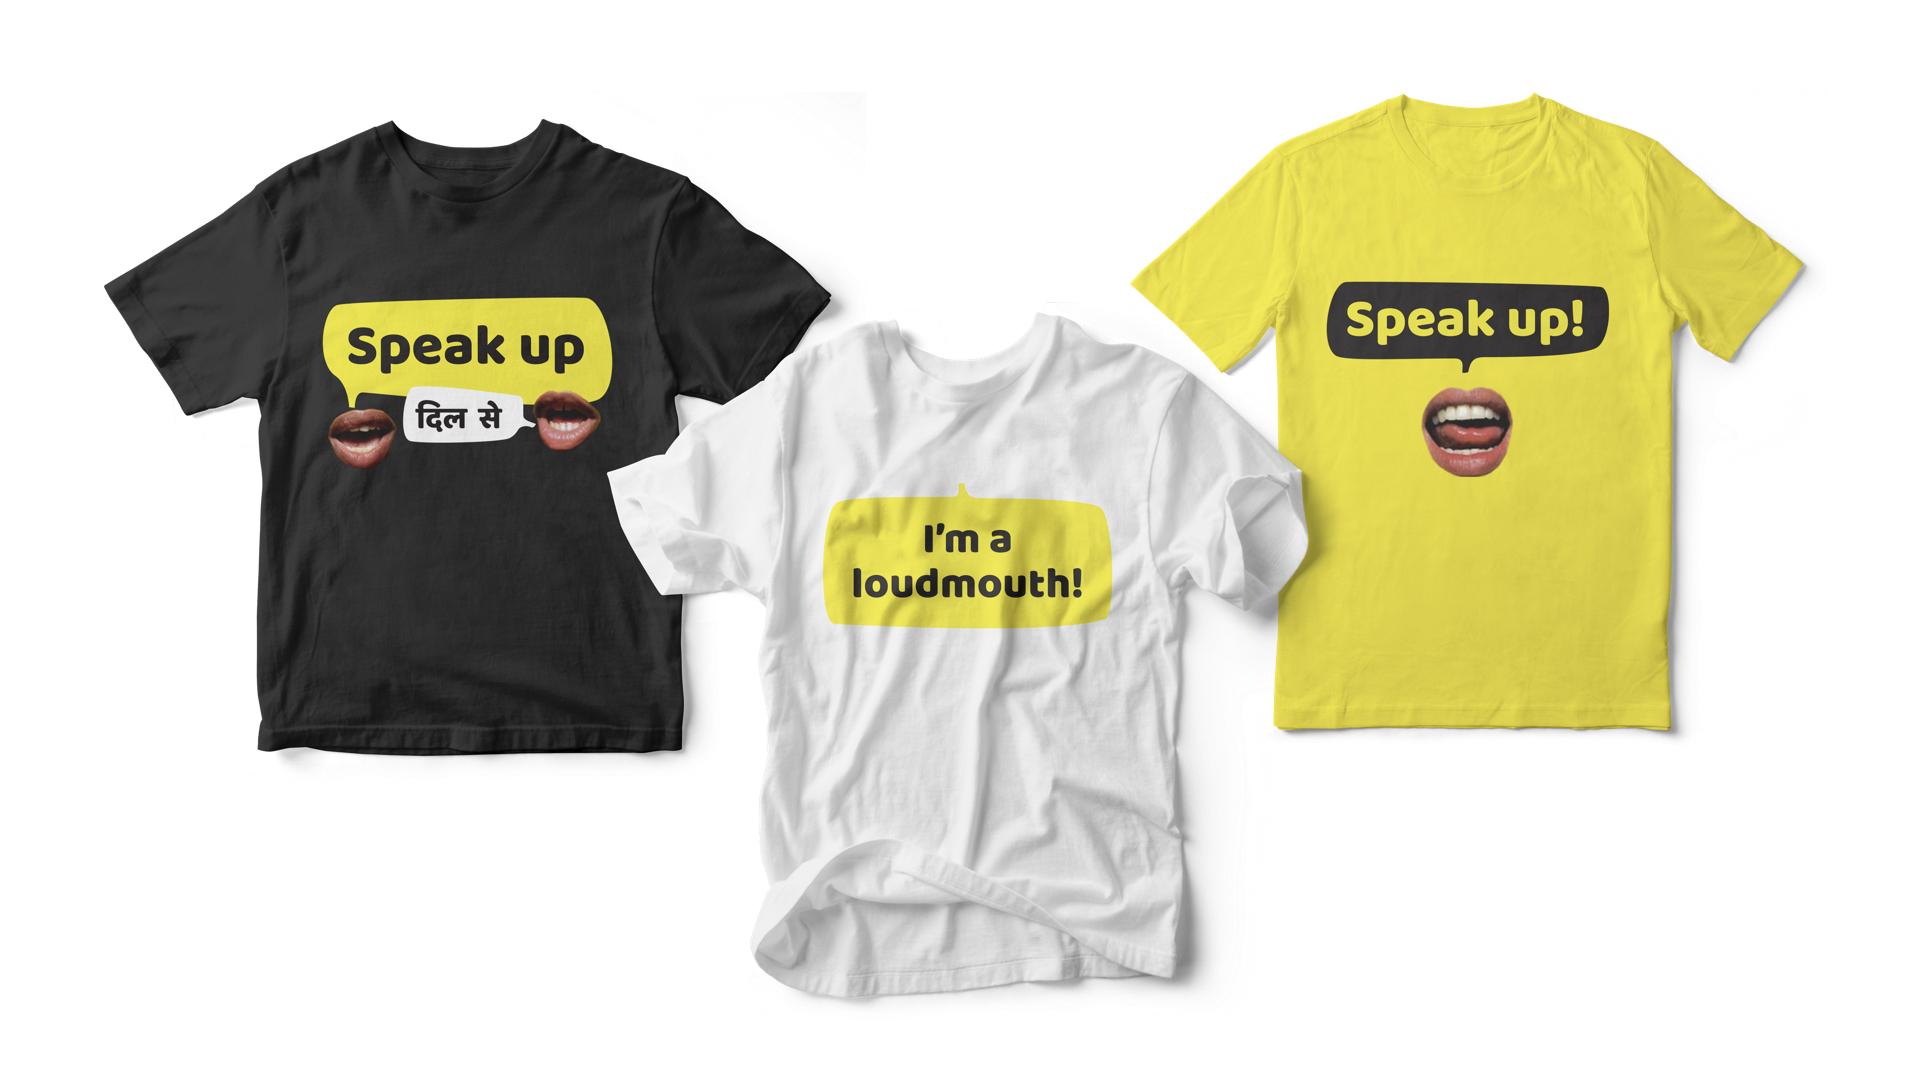 inlingua_presentation-copy.011.jpg